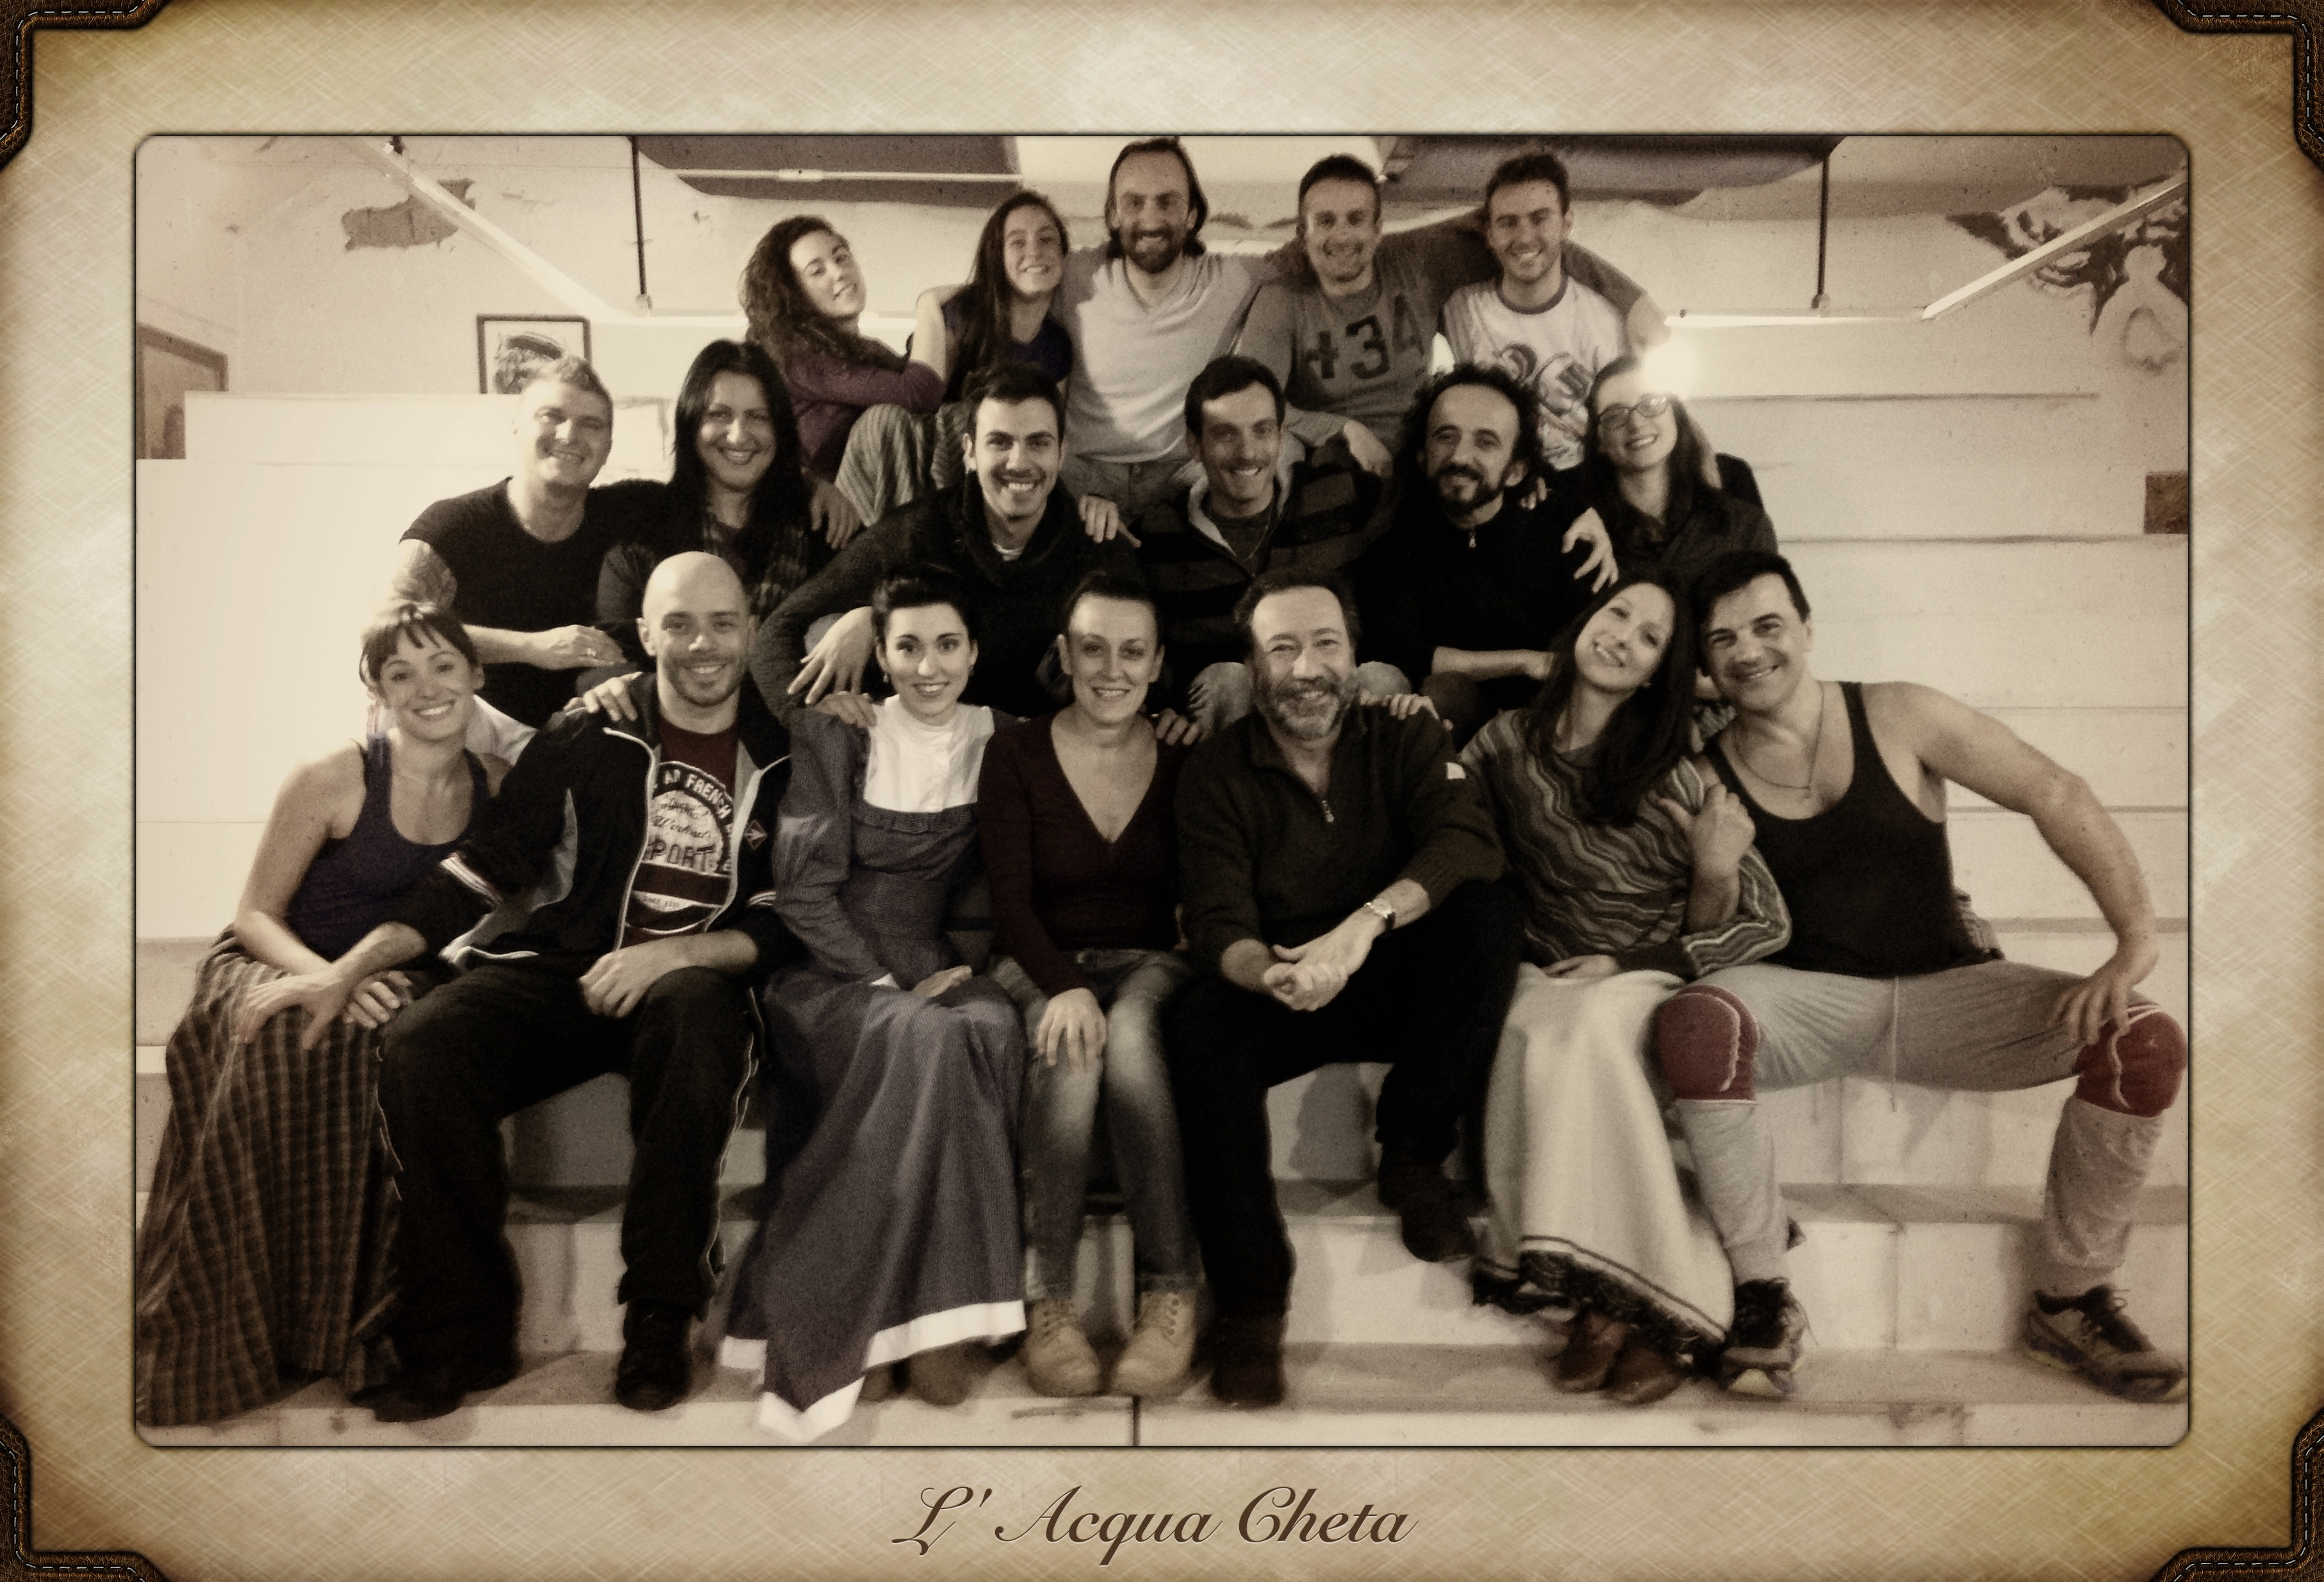 Cast de L'Acqua Cheta